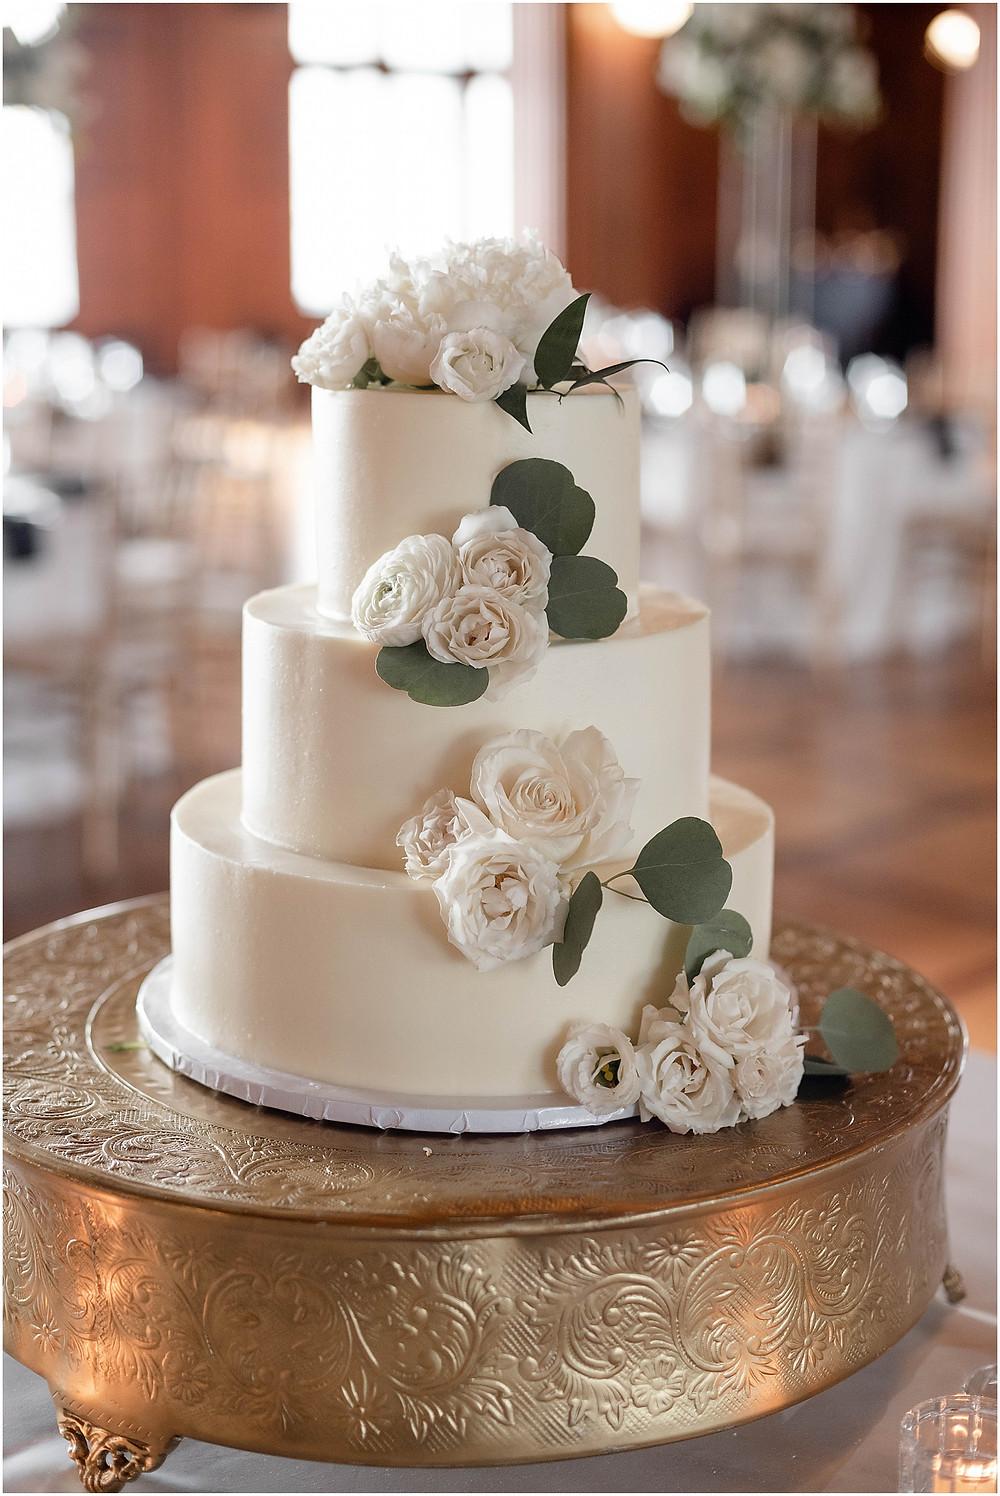 cake-Scottish-Rite-Cathedral-Wedding-Reception